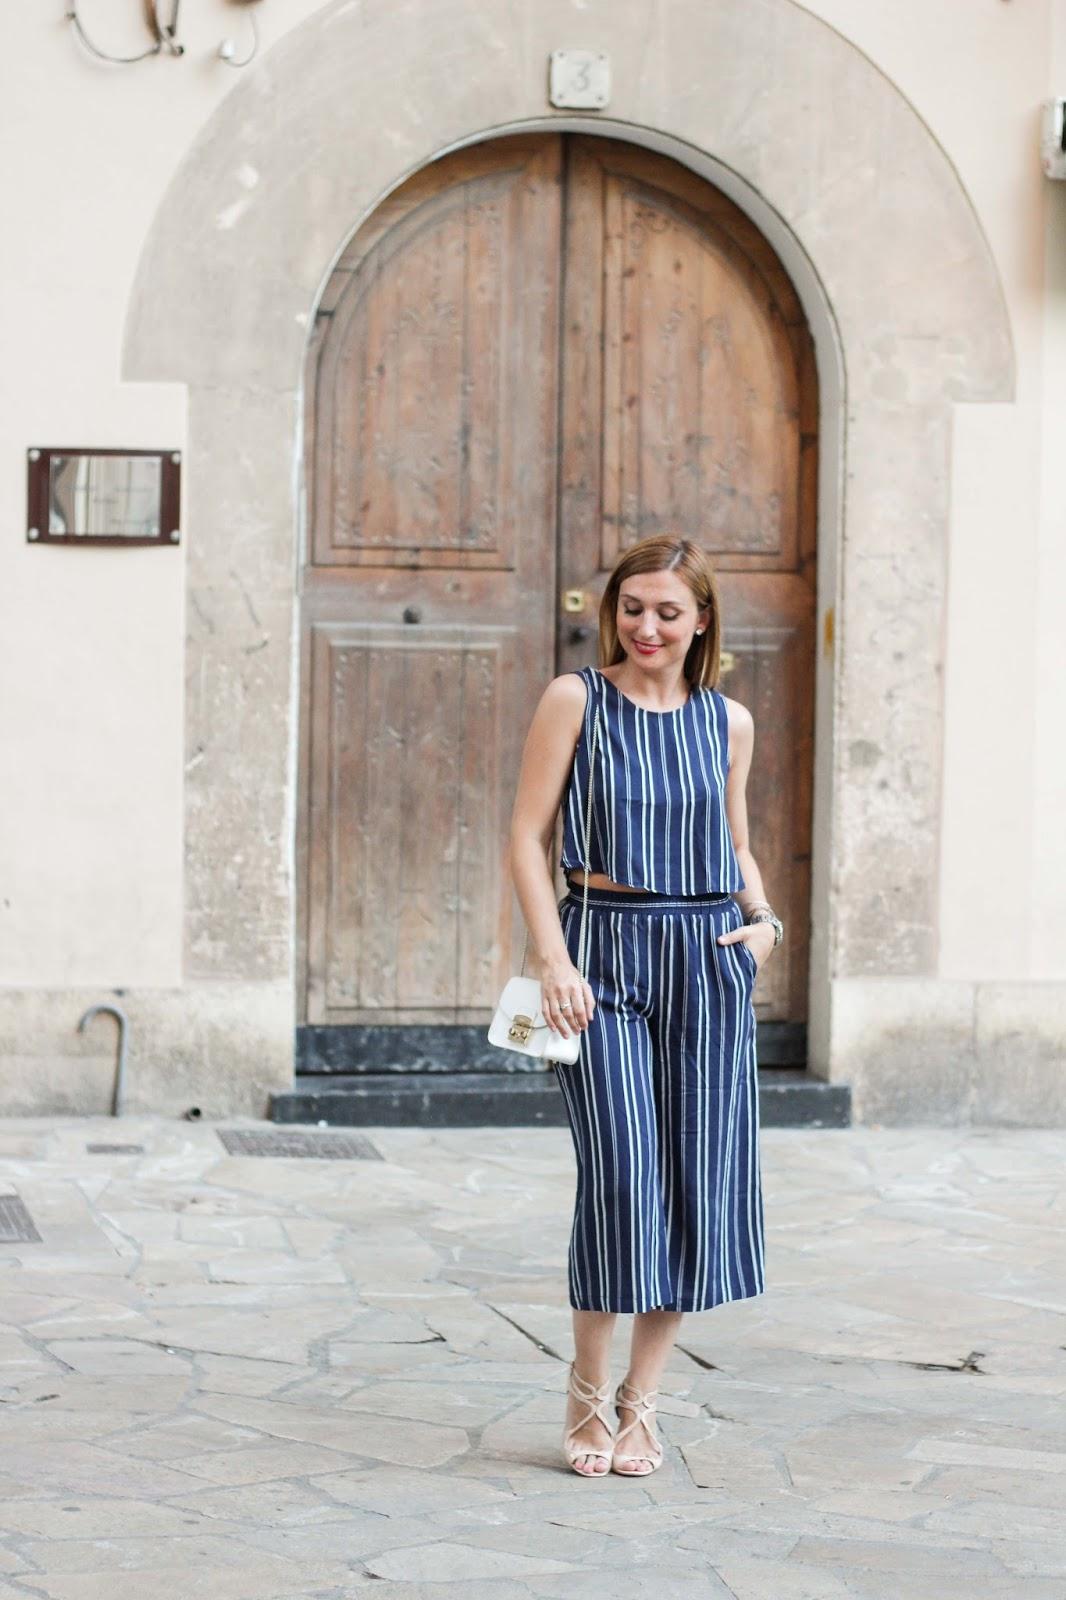 Fashionstylebyjohanna - Fashionblogger aus Frankfurt - Frankfurt Blogger - Fashionblogger aus Deutschland -Deutsche Fashionblogger